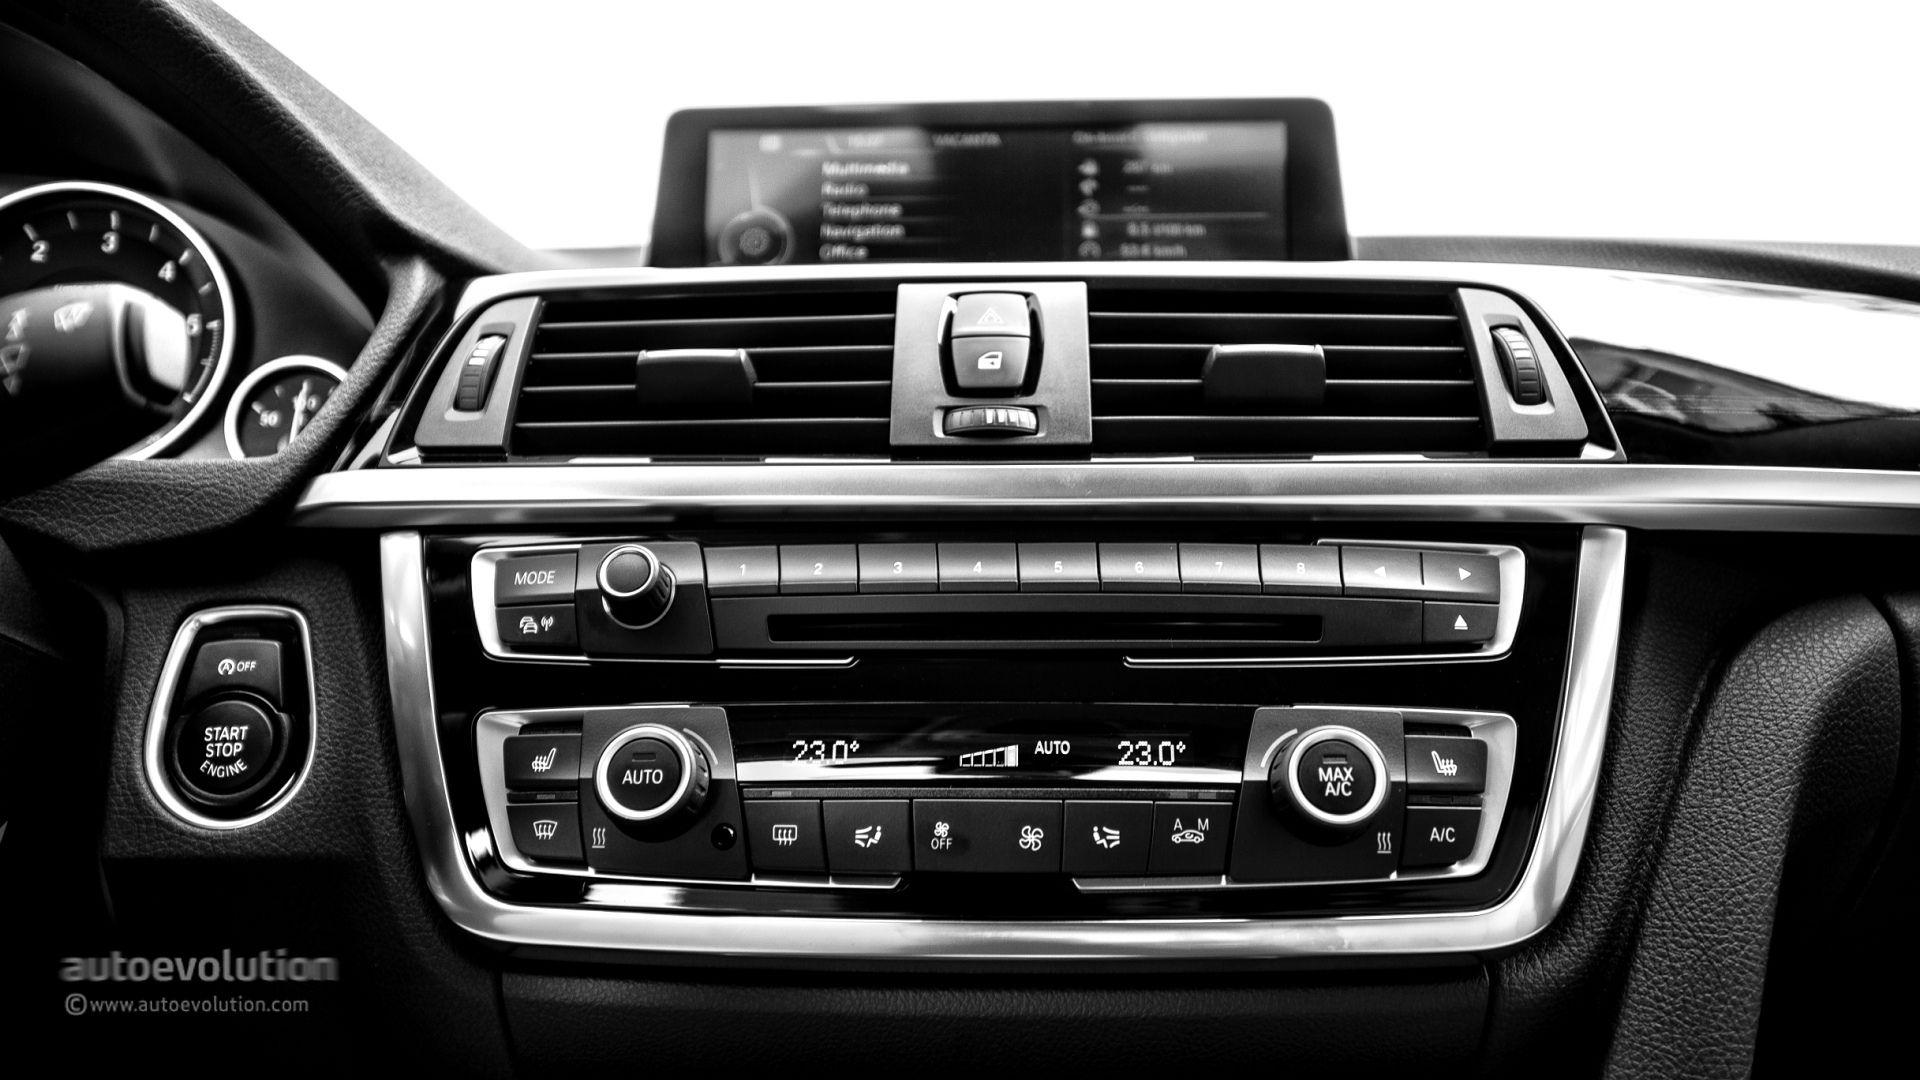 Bmw 4 series gran coupe review http www autoevolution com